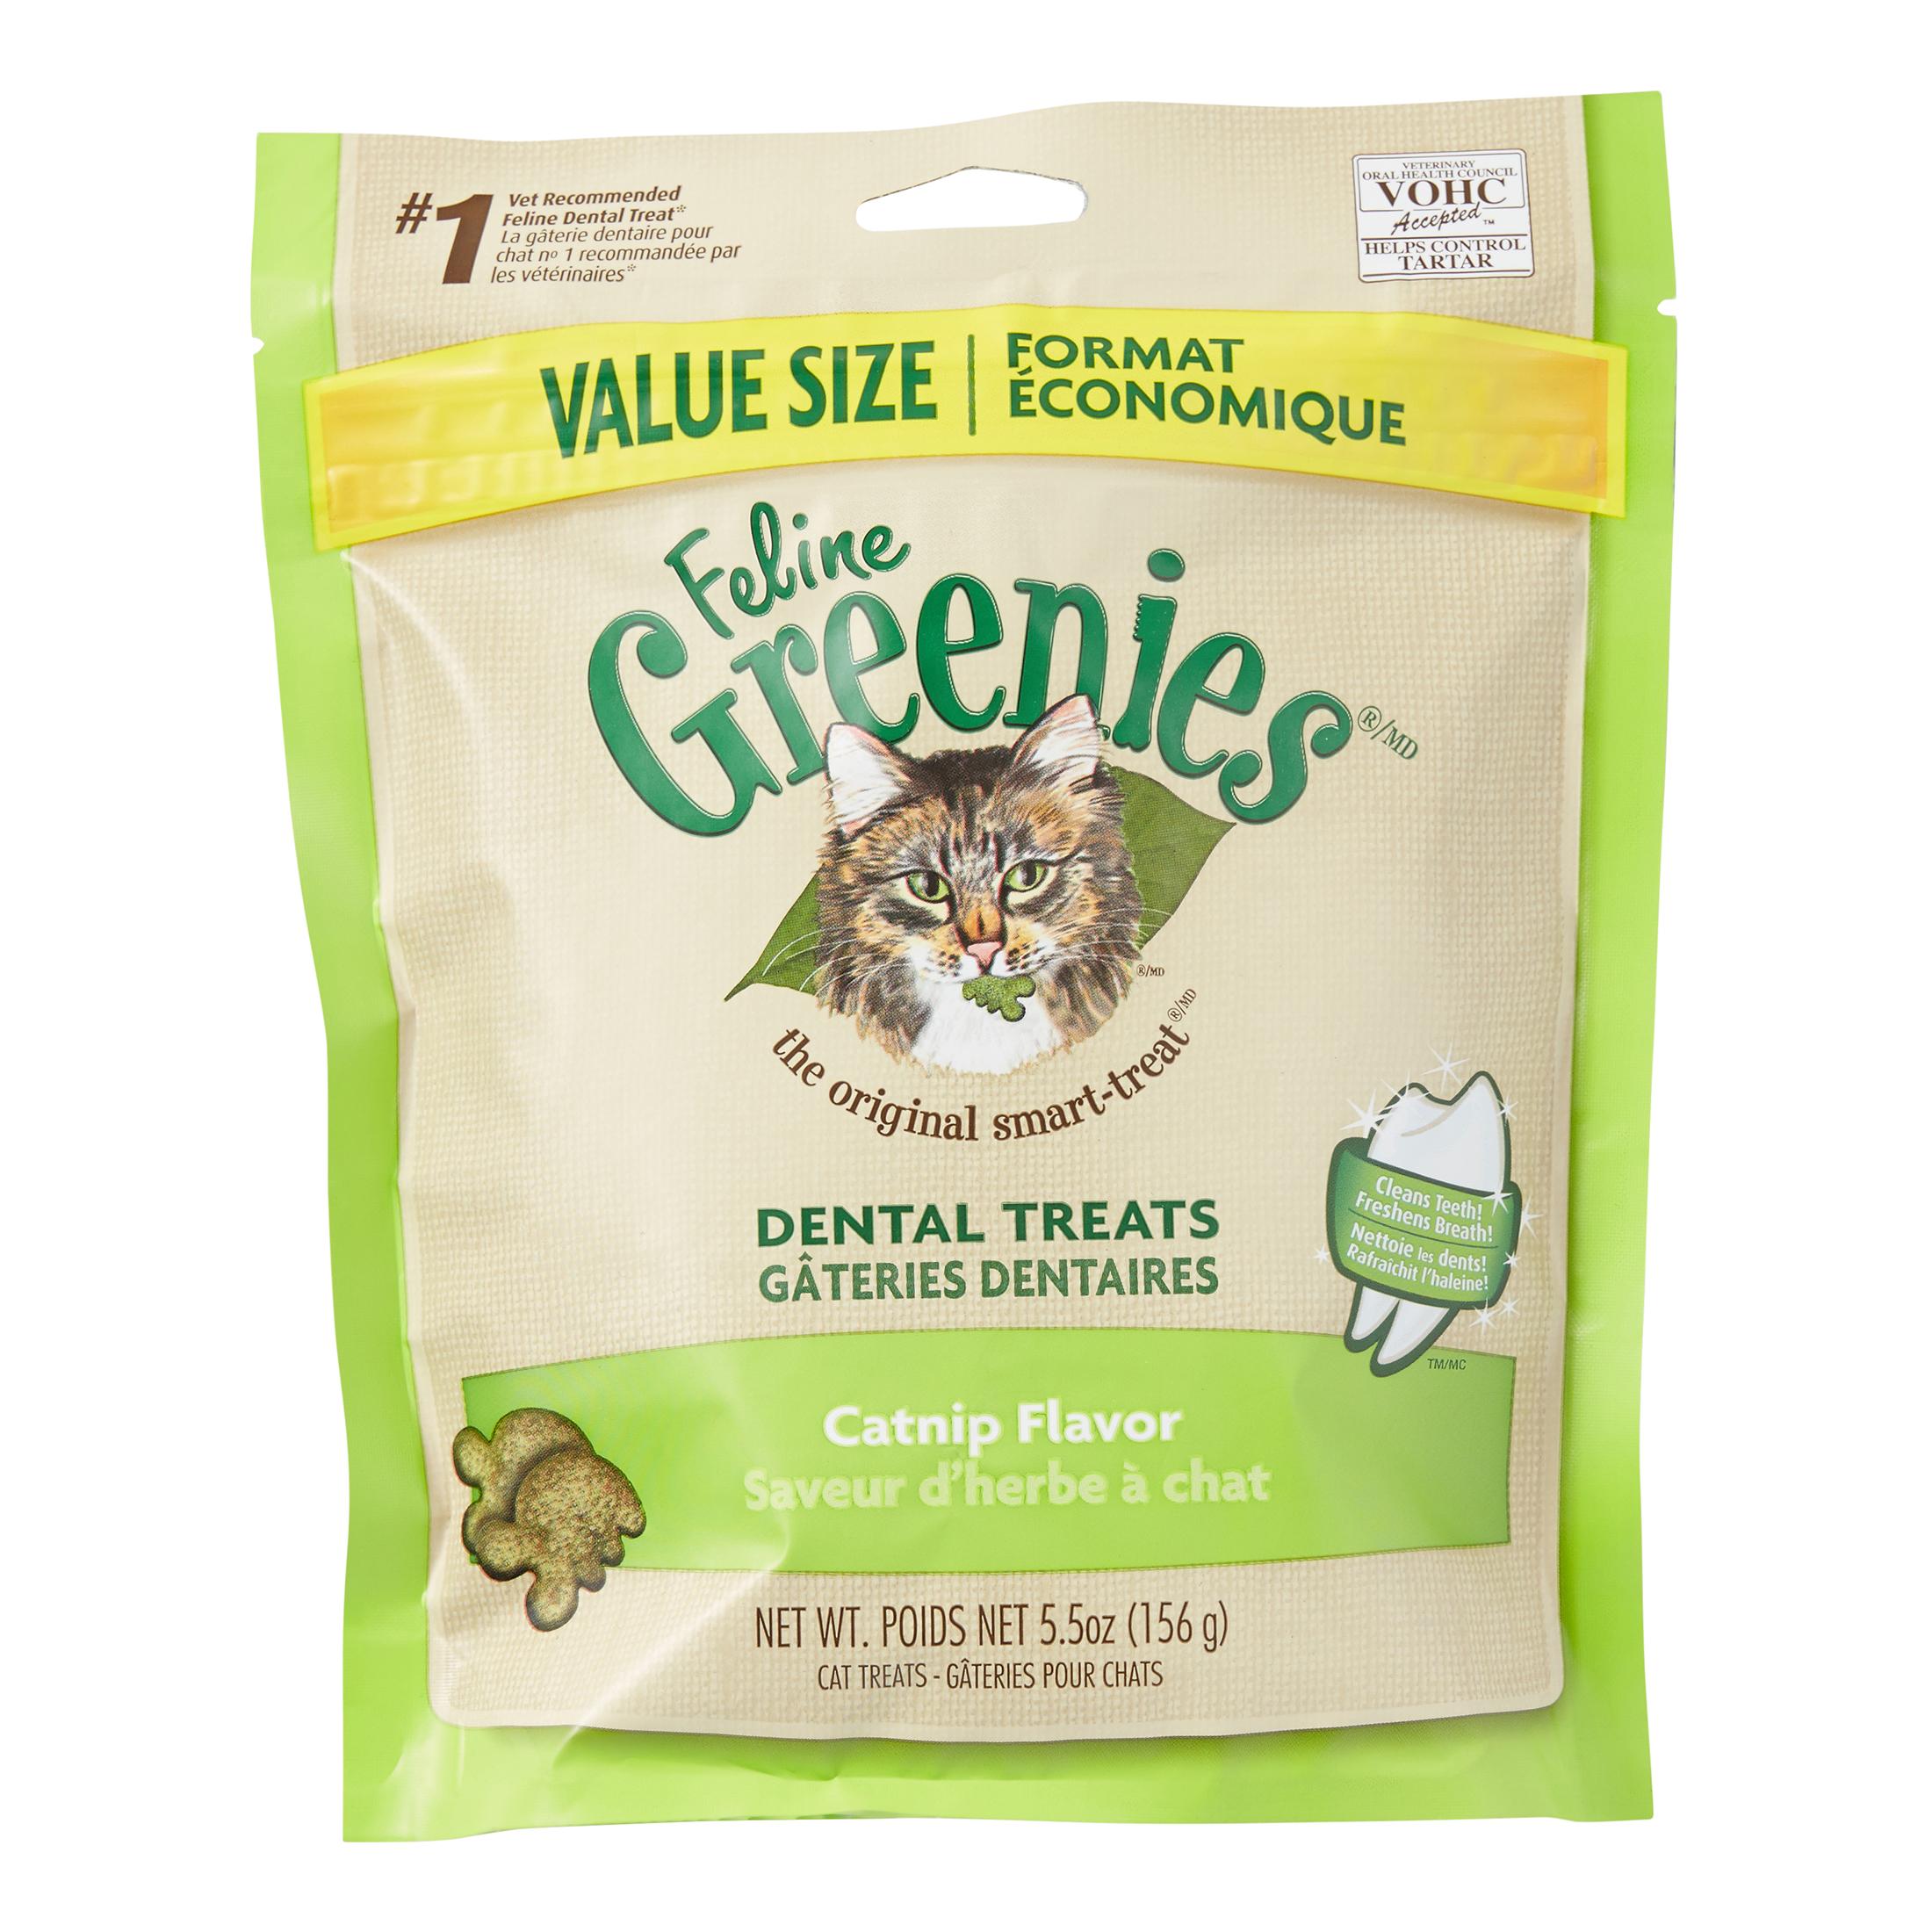 FELINE GREENIES Dental Treats for Cats Catnip Flavor 5.5 oz. by Whole Earth Farms